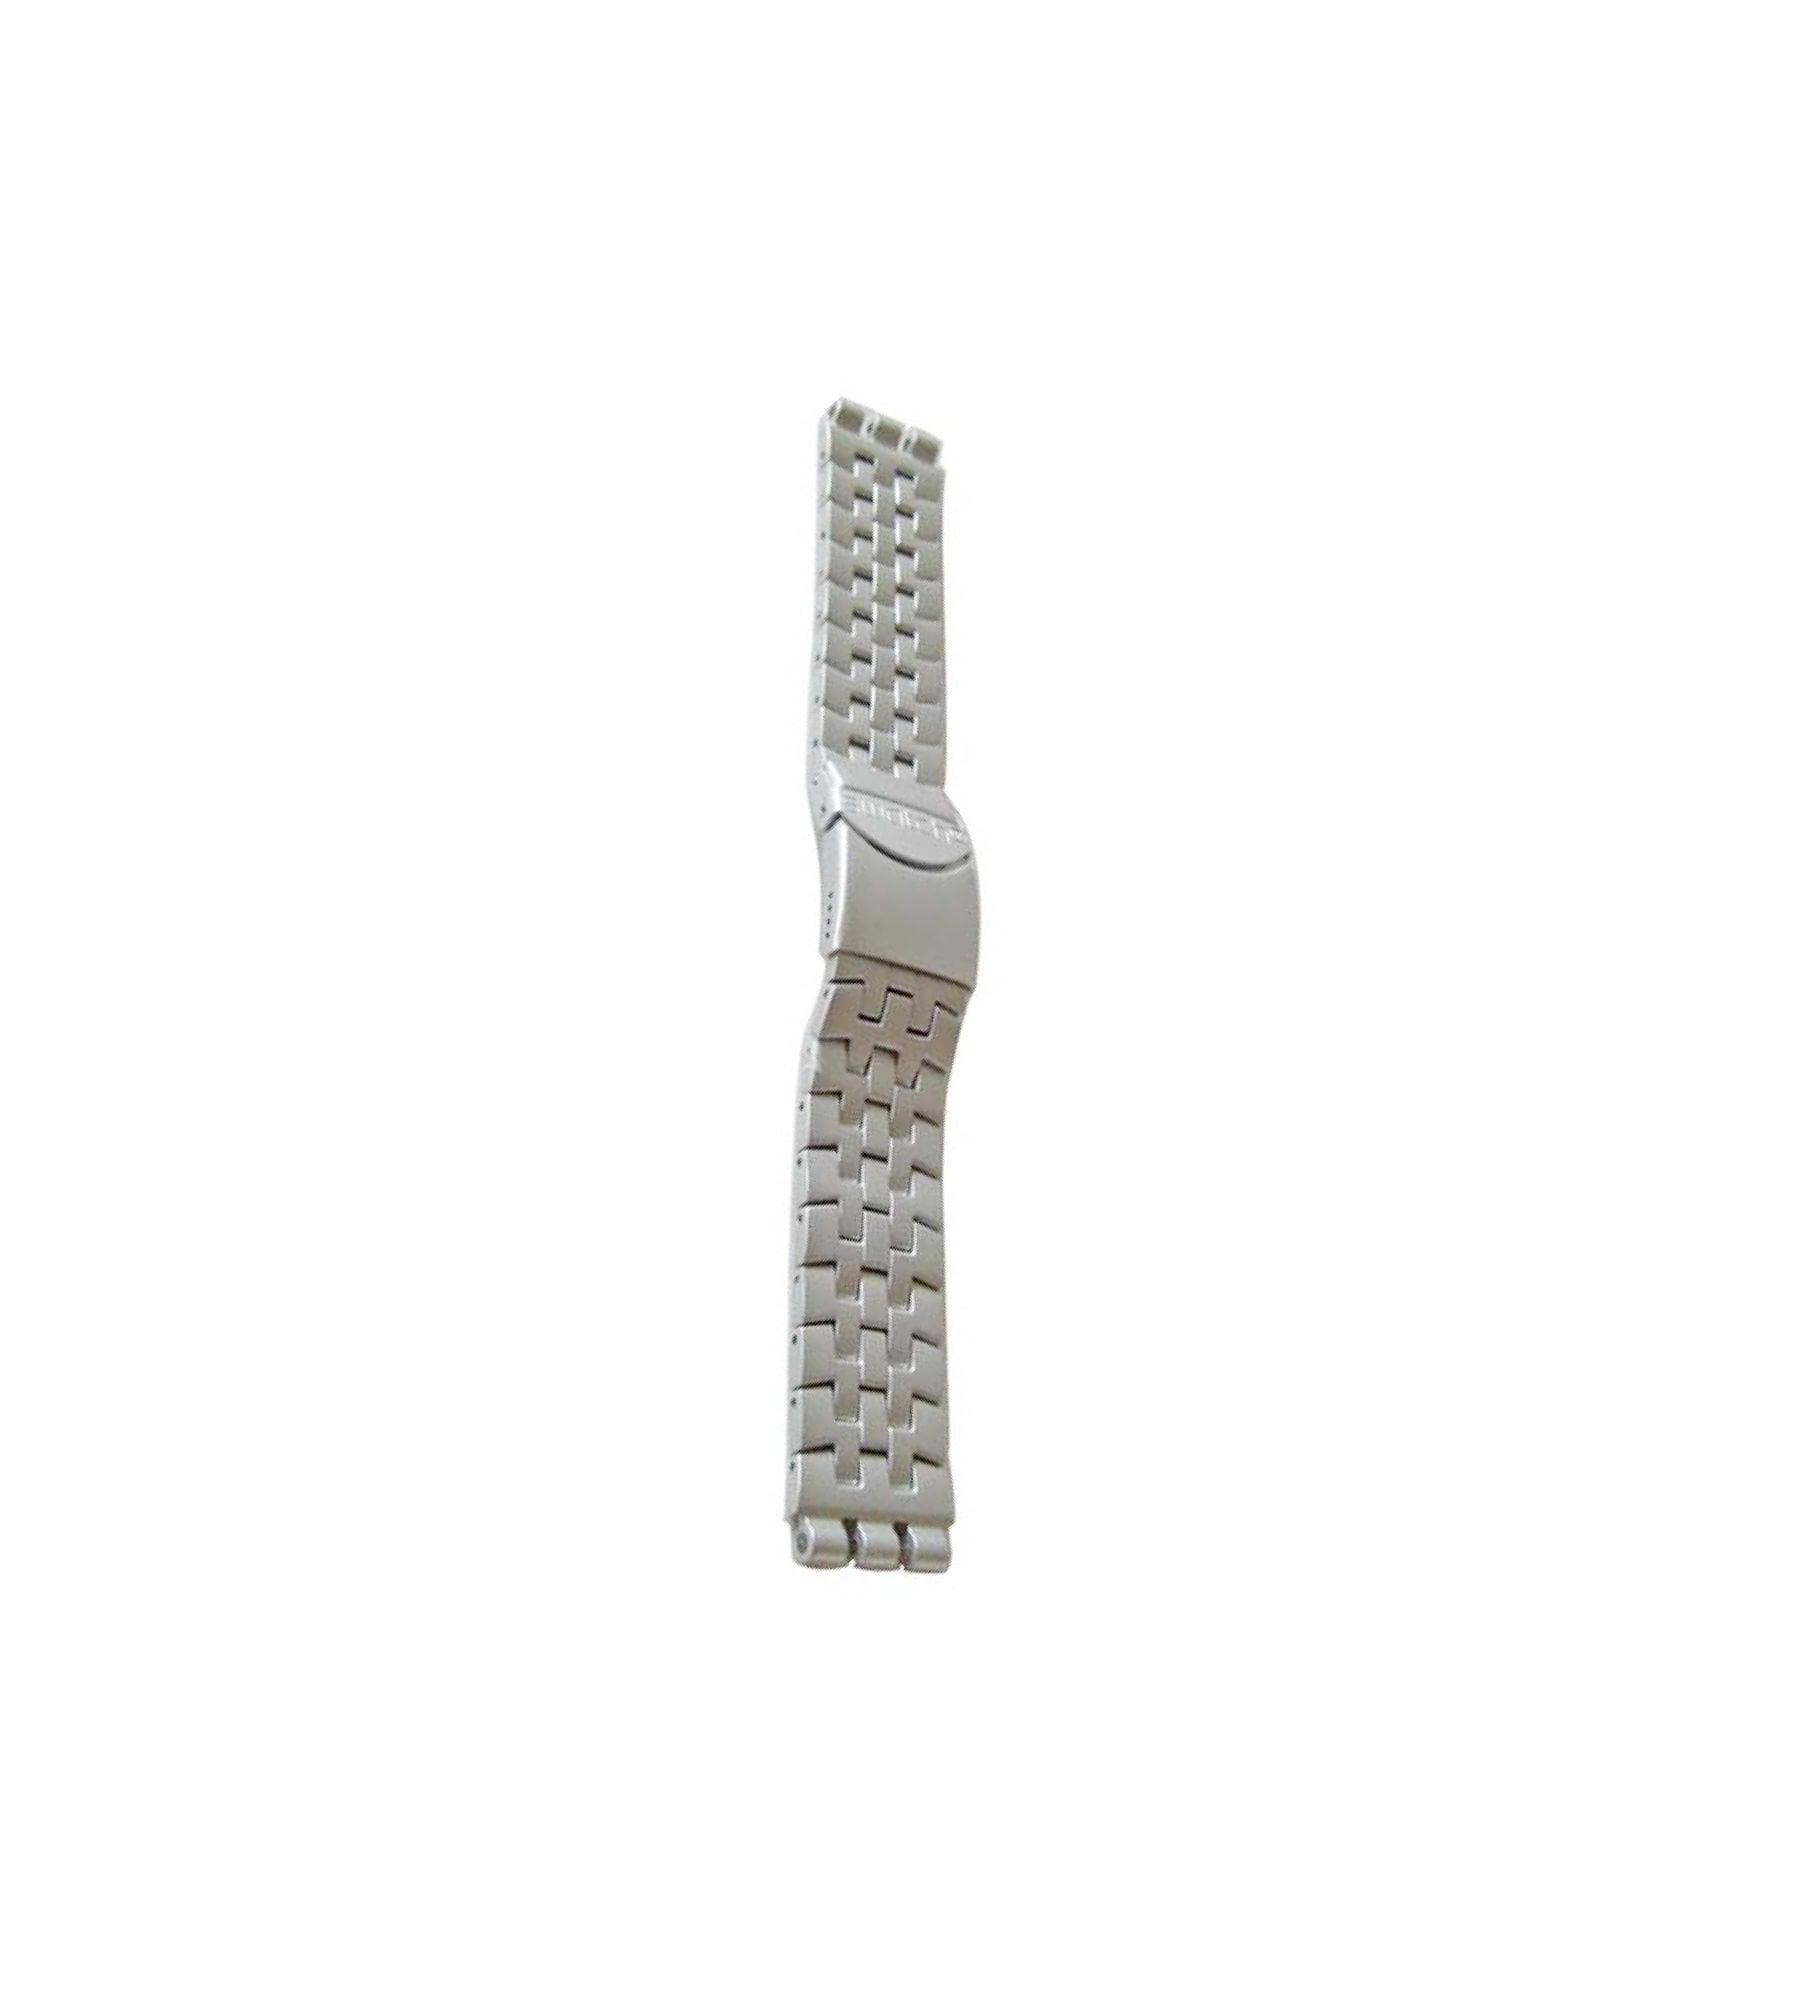 ee625abc23e Swatch® Portugal - Irony Chrono GREYSCALE   ALU ADJ.STRAP ACYCS4046AG